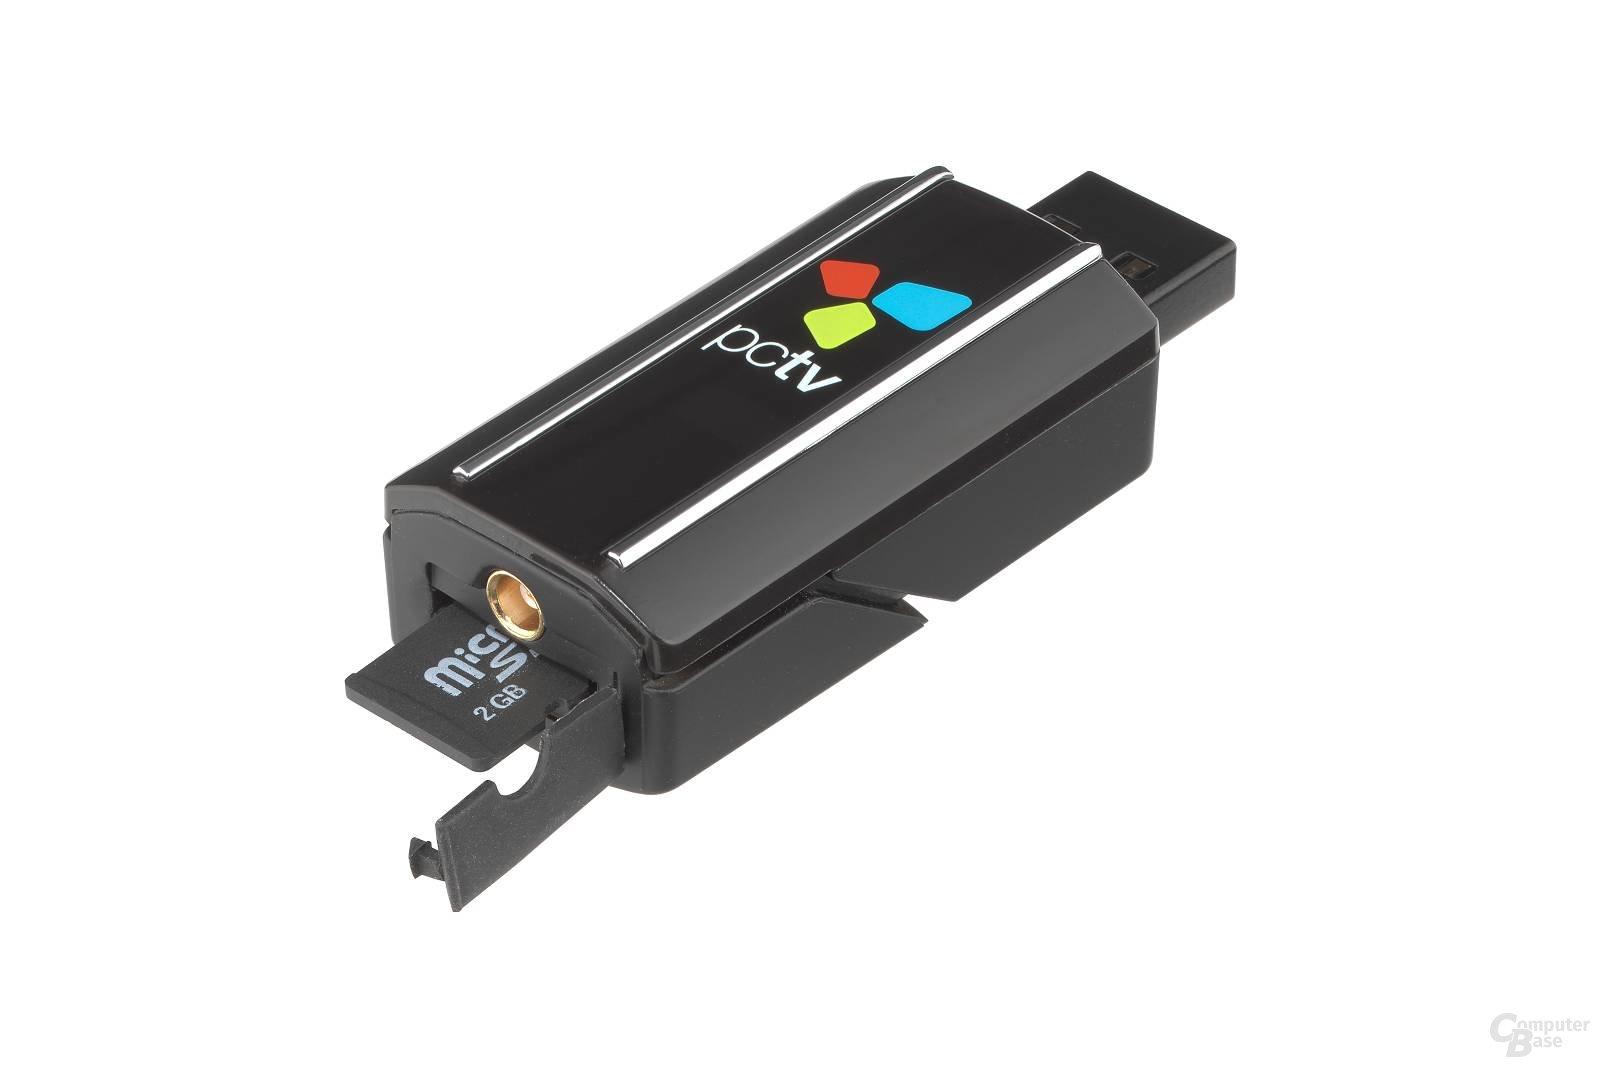 PCTV FlashStick nano